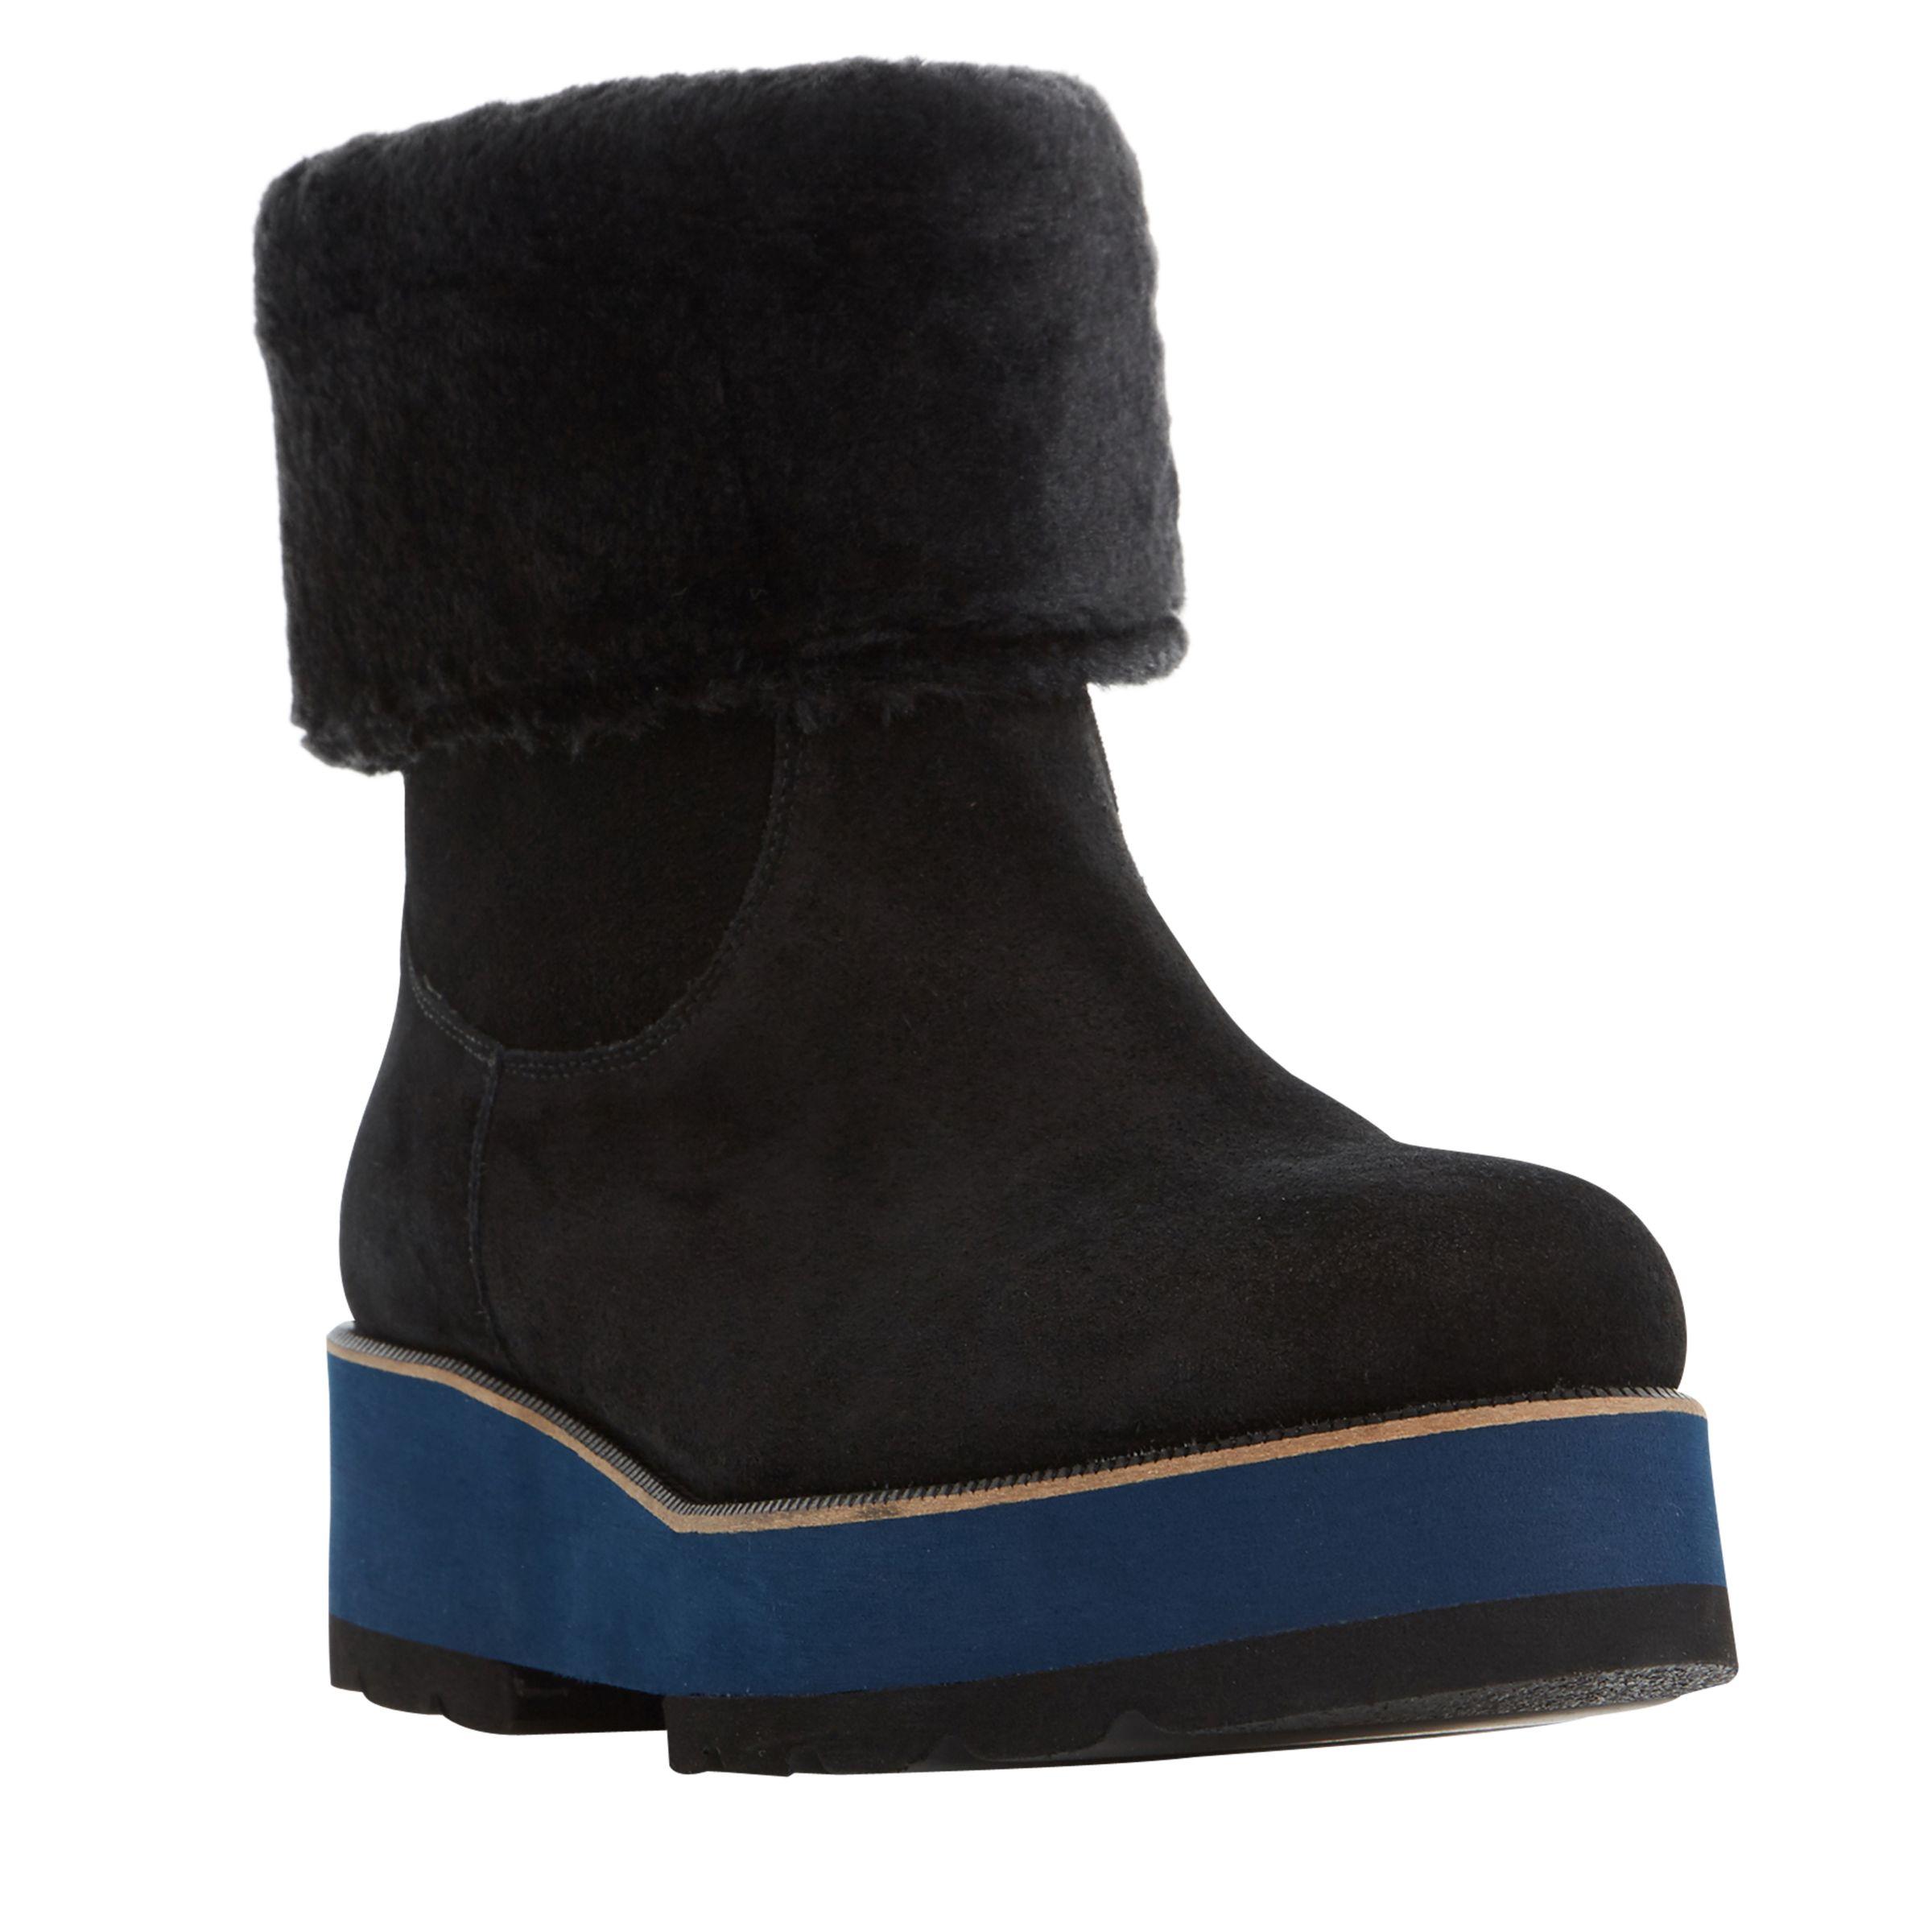 Dune Black Dune Black Rome Flatform Ankle Boots